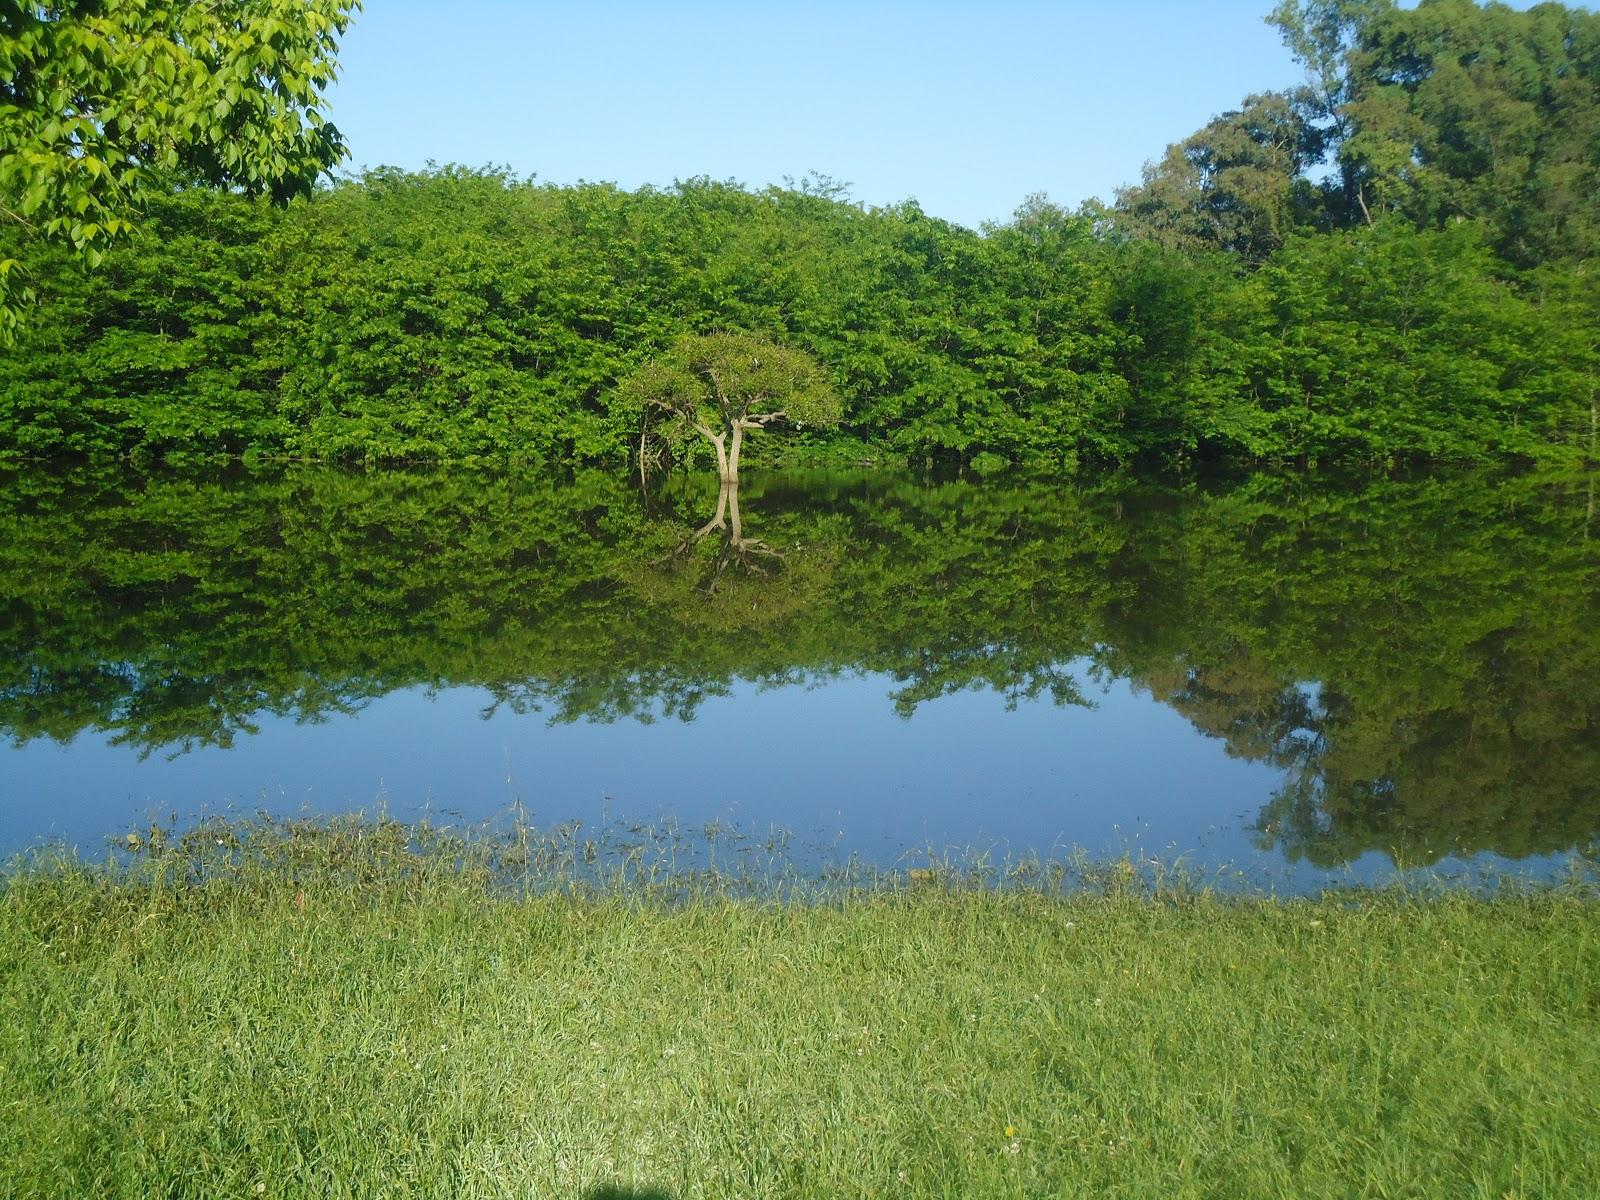 El ureo espantajo el estanque de agua quieta for Oxigenacion del agua en estanques